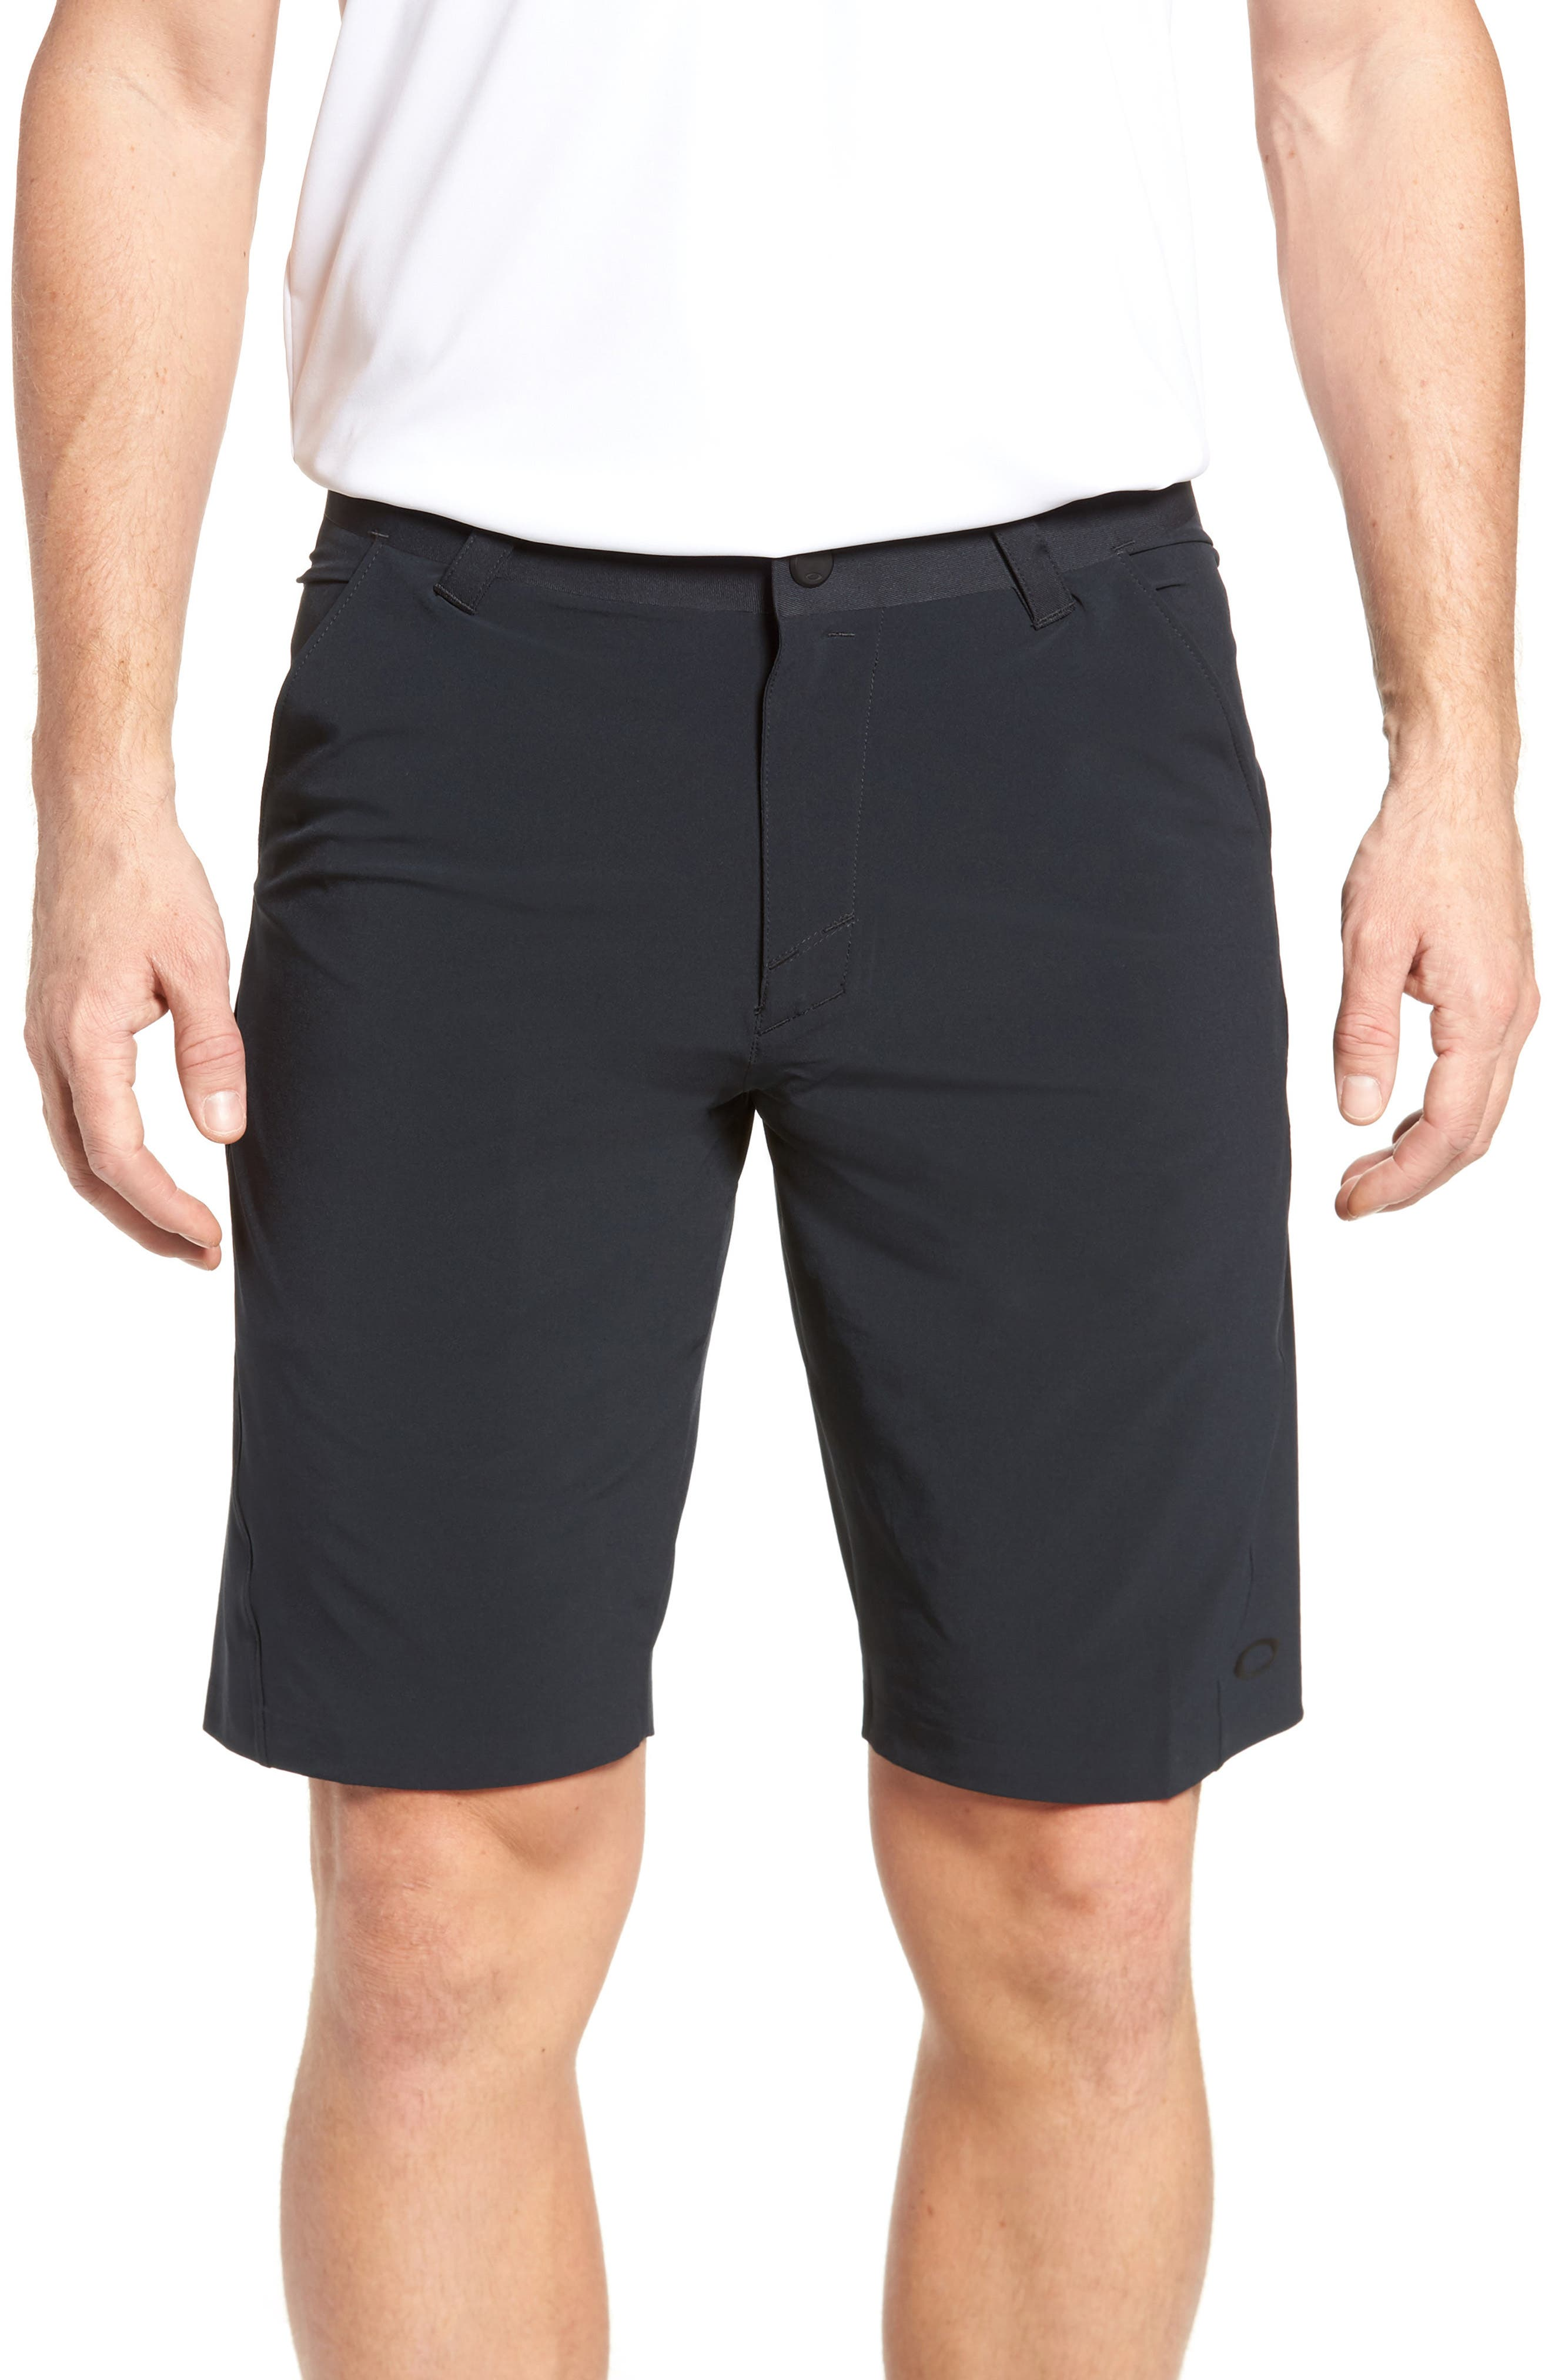 Velocity Shorts,                         Main,                         color, 001